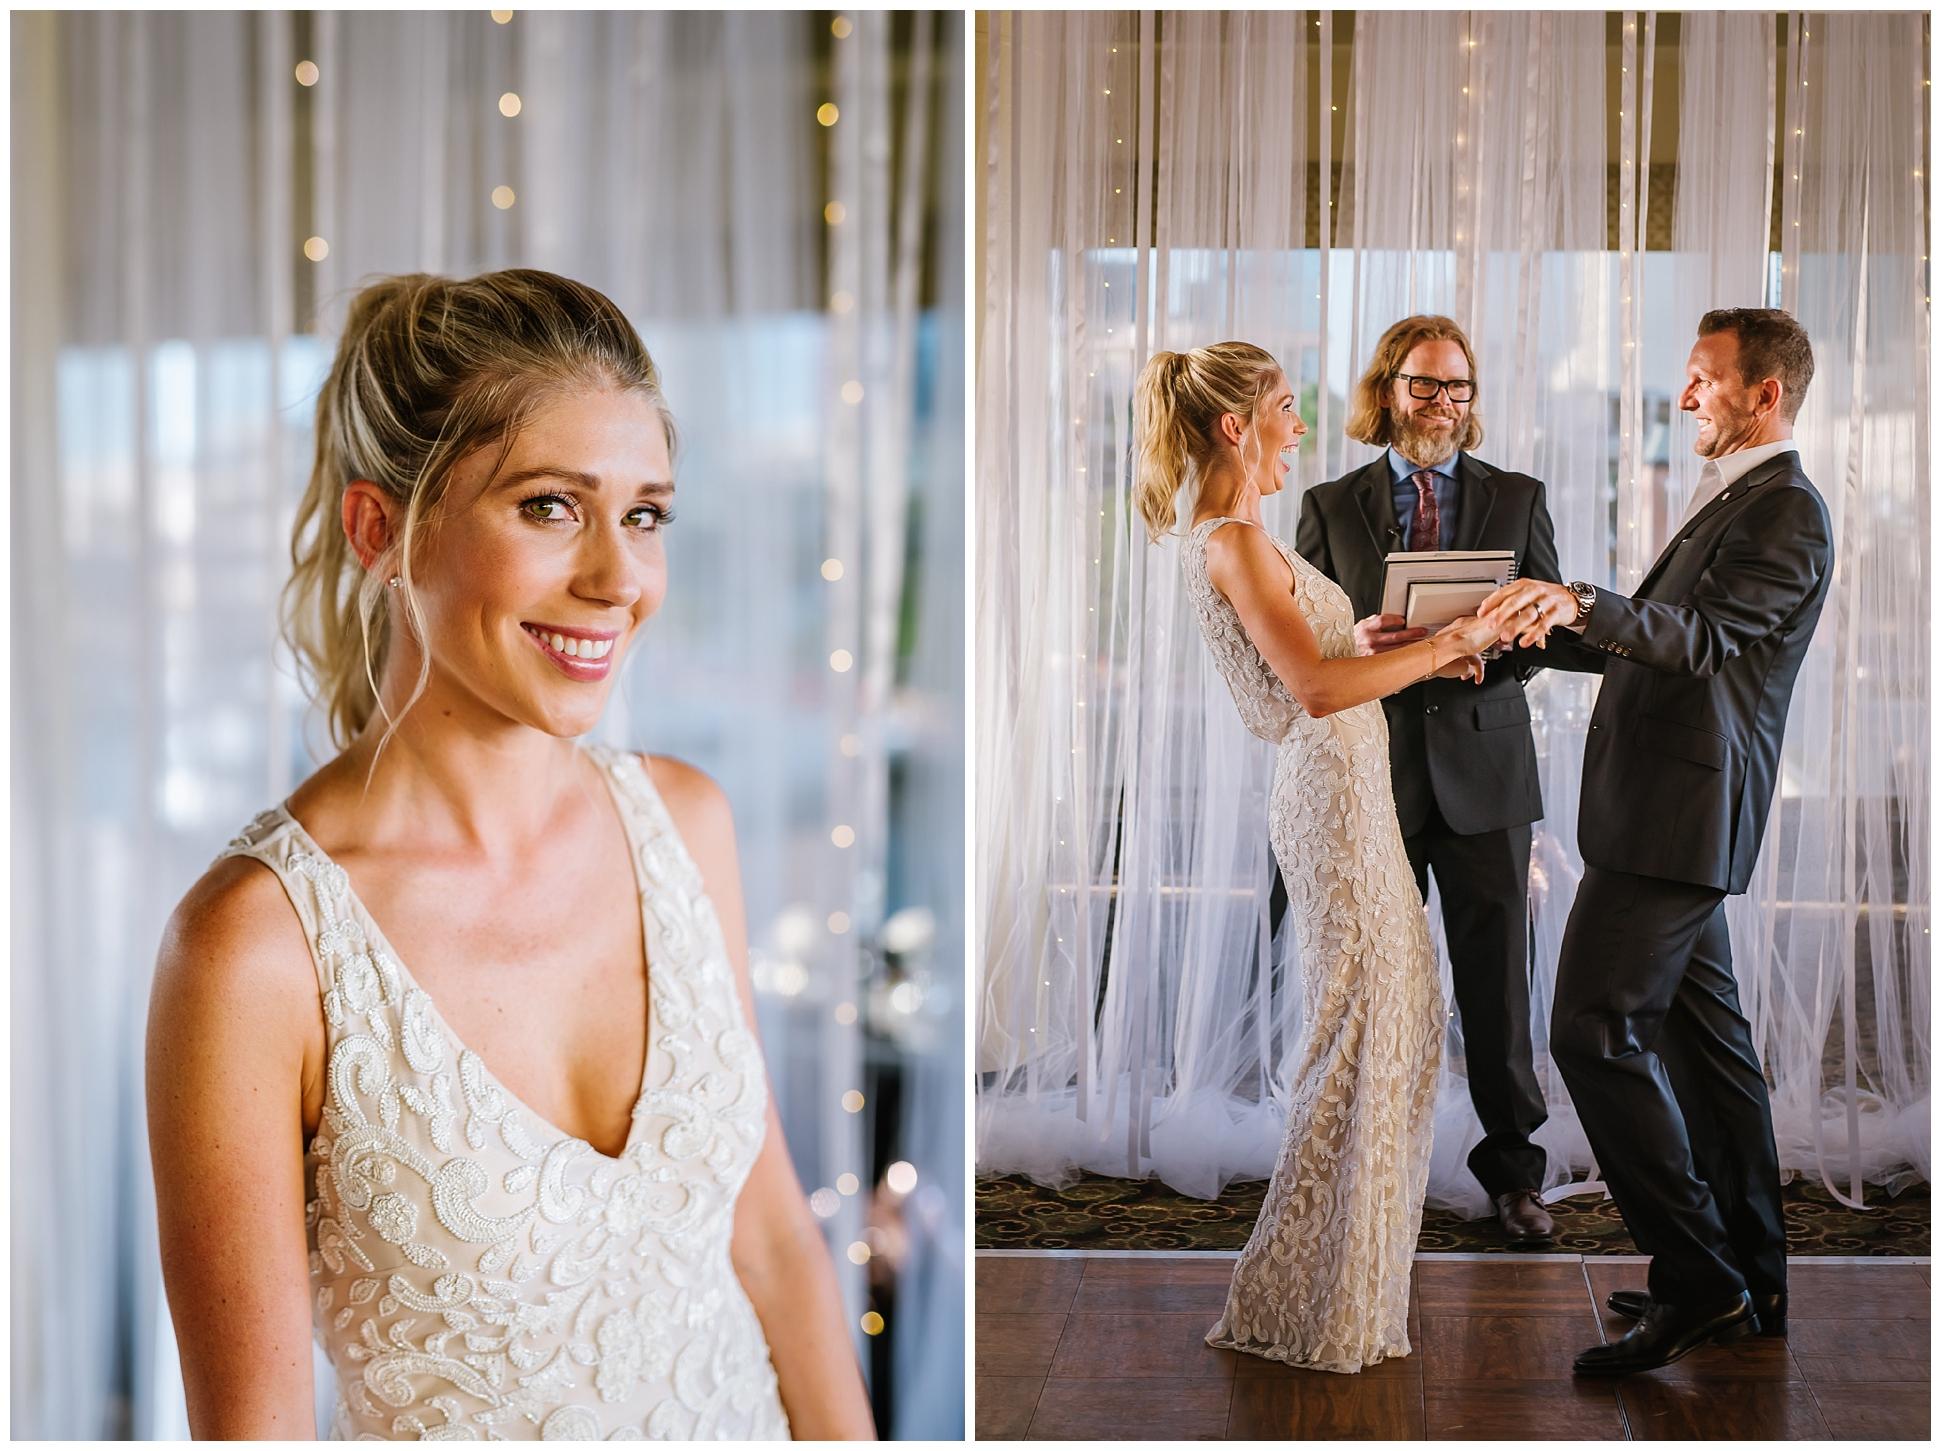 Ashlee-hamon-photography-year-in-review-2016-travel-wanderlust-vsco-adventure-wedding_0096.jpg